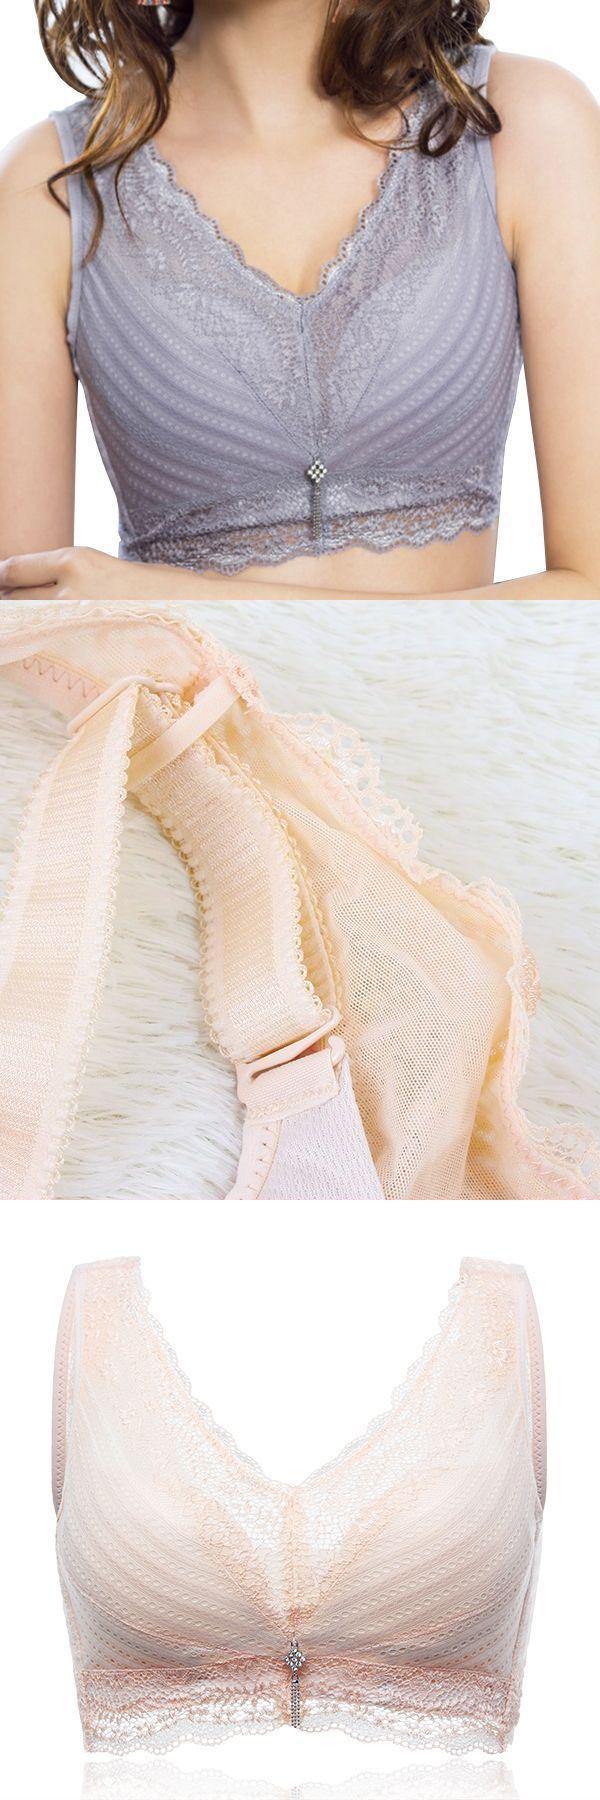 Sexy comfortable seamless wireless mesh wide-set double straps adjustable bras bra set bra set #bra #new #fashion #fantasy #bra #2015 #fashion #show #lady #bra #fashion #design #open #bra #fashion #show